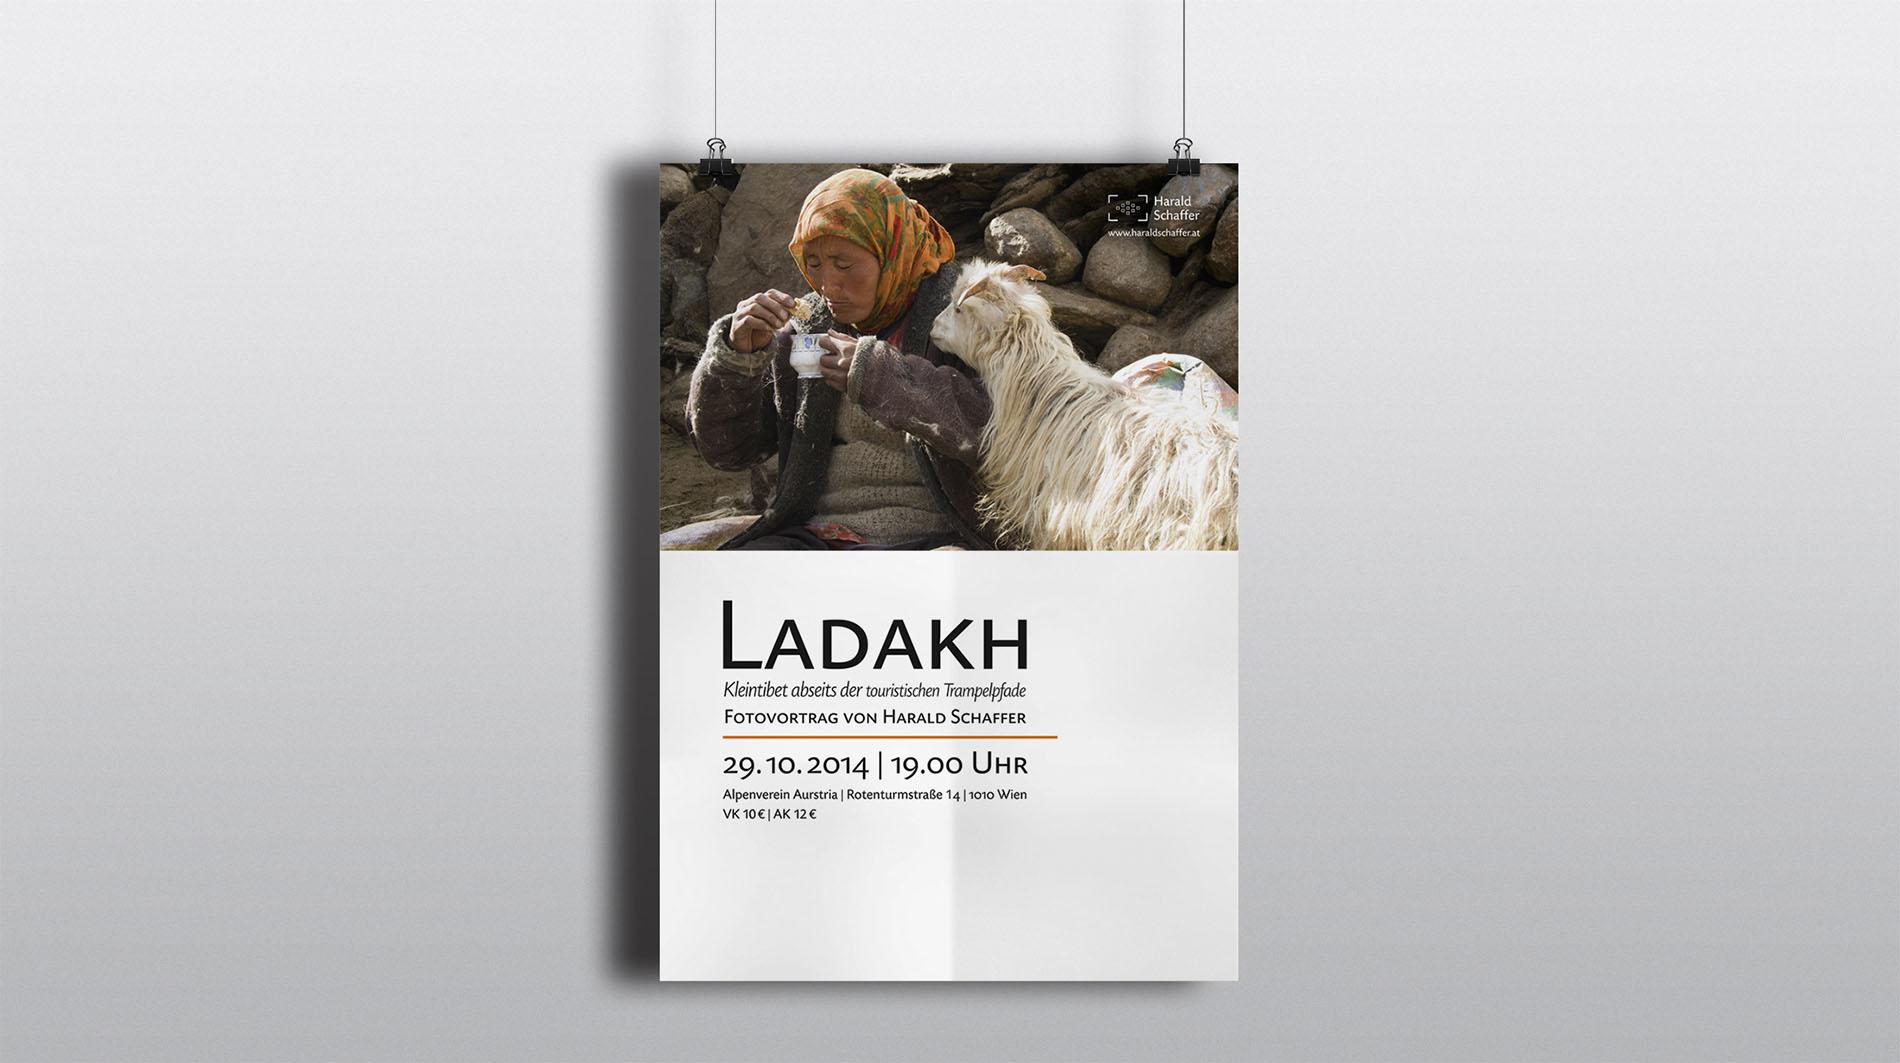 CD Harald Schaffer   Vortragsplakat Ladakh